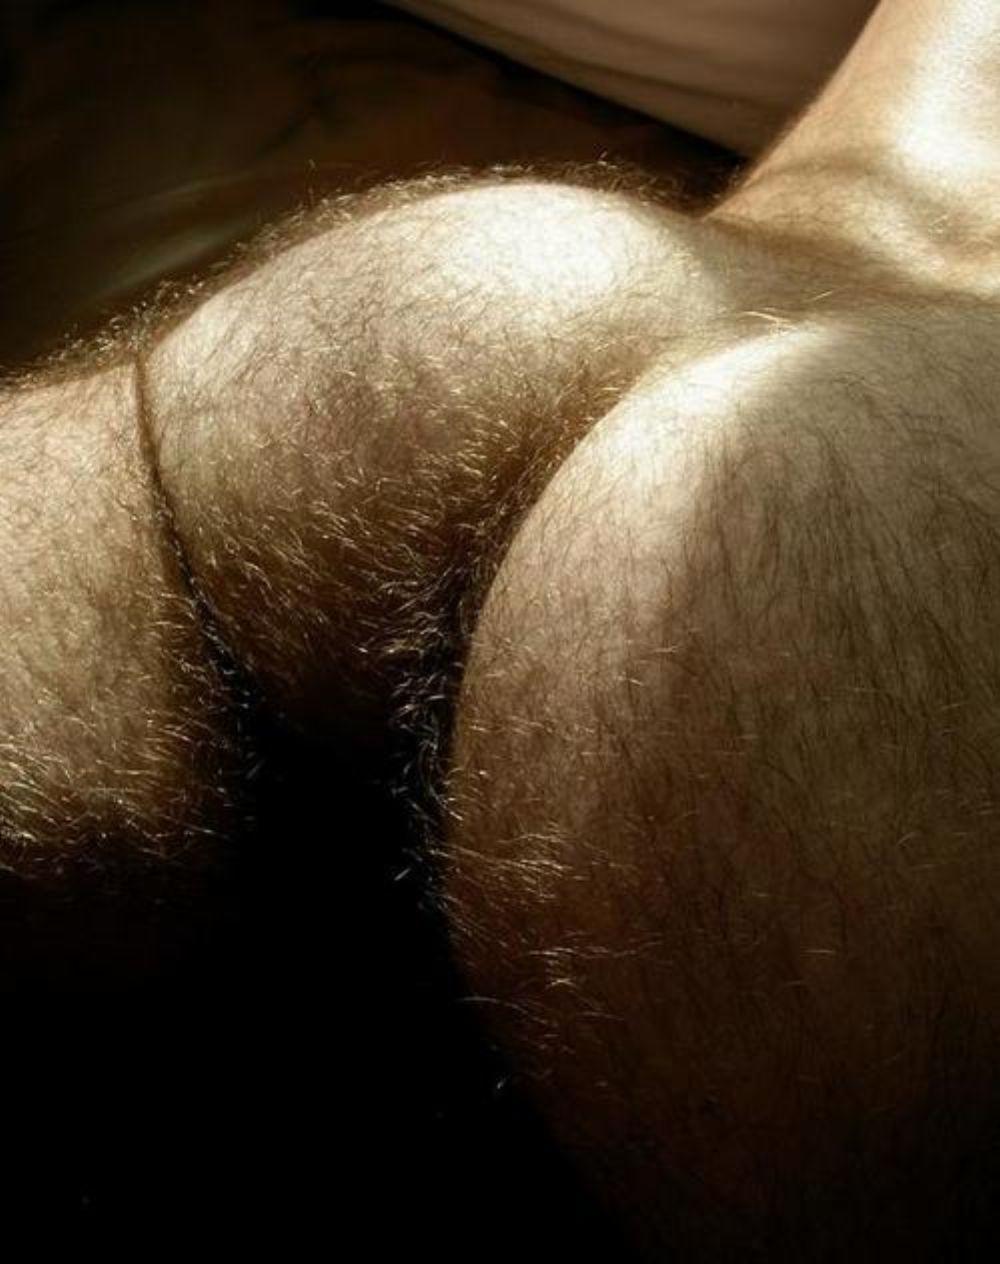 Попа мужская волосатая